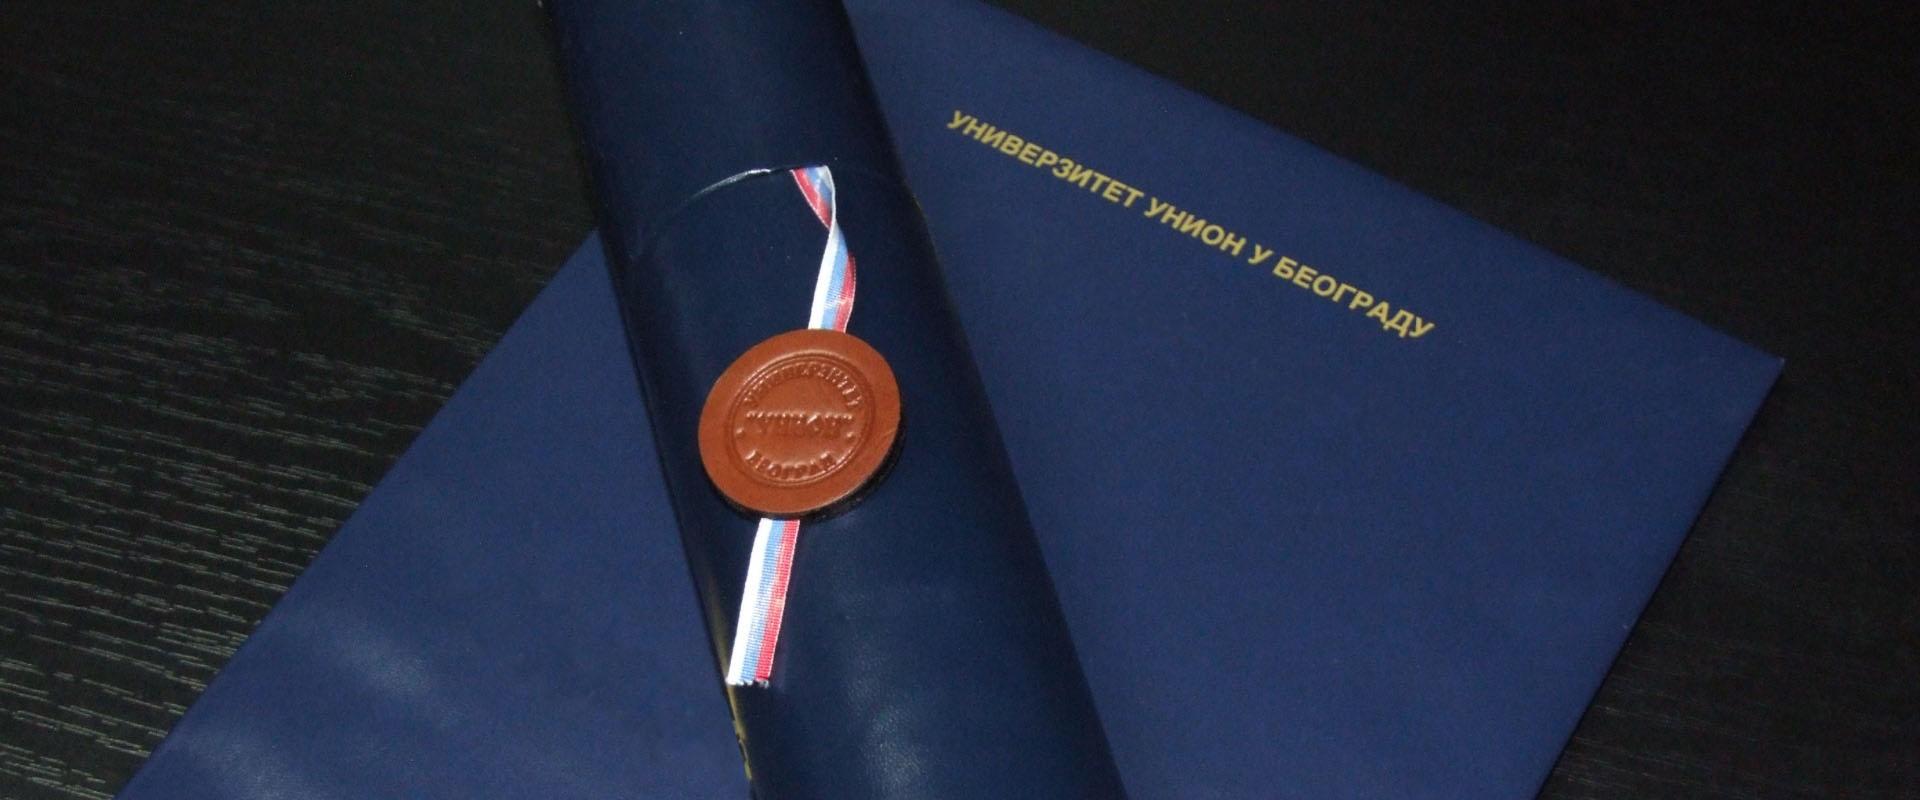 Диплома Универзитета Унион у Београду